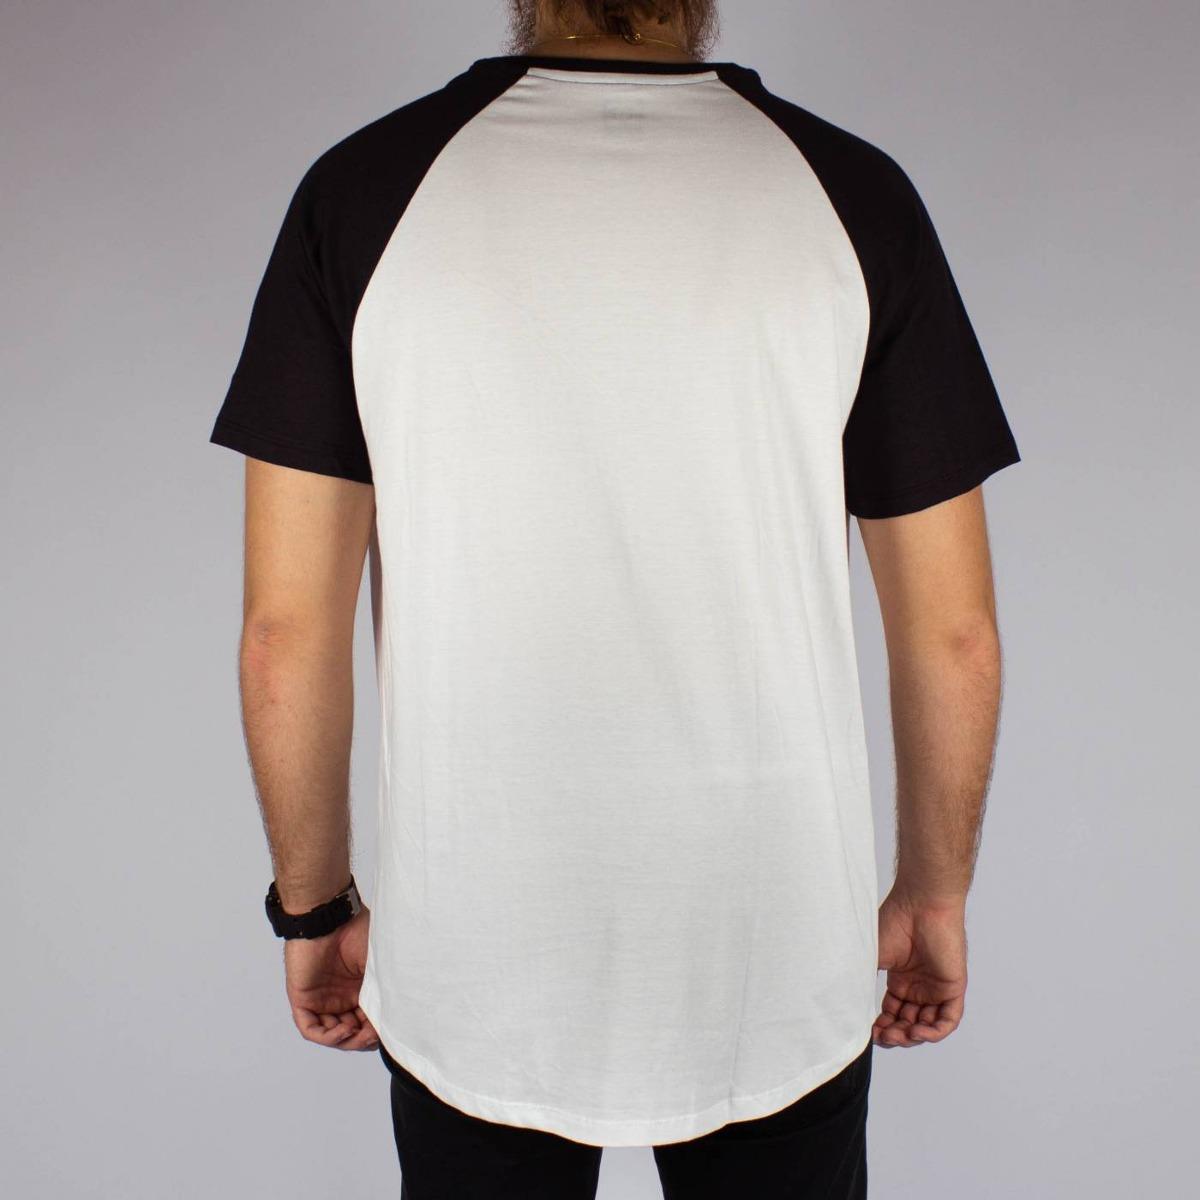 676396c965 camiseta dc shoes star raglan branca preta original skate. Carregando zoom.